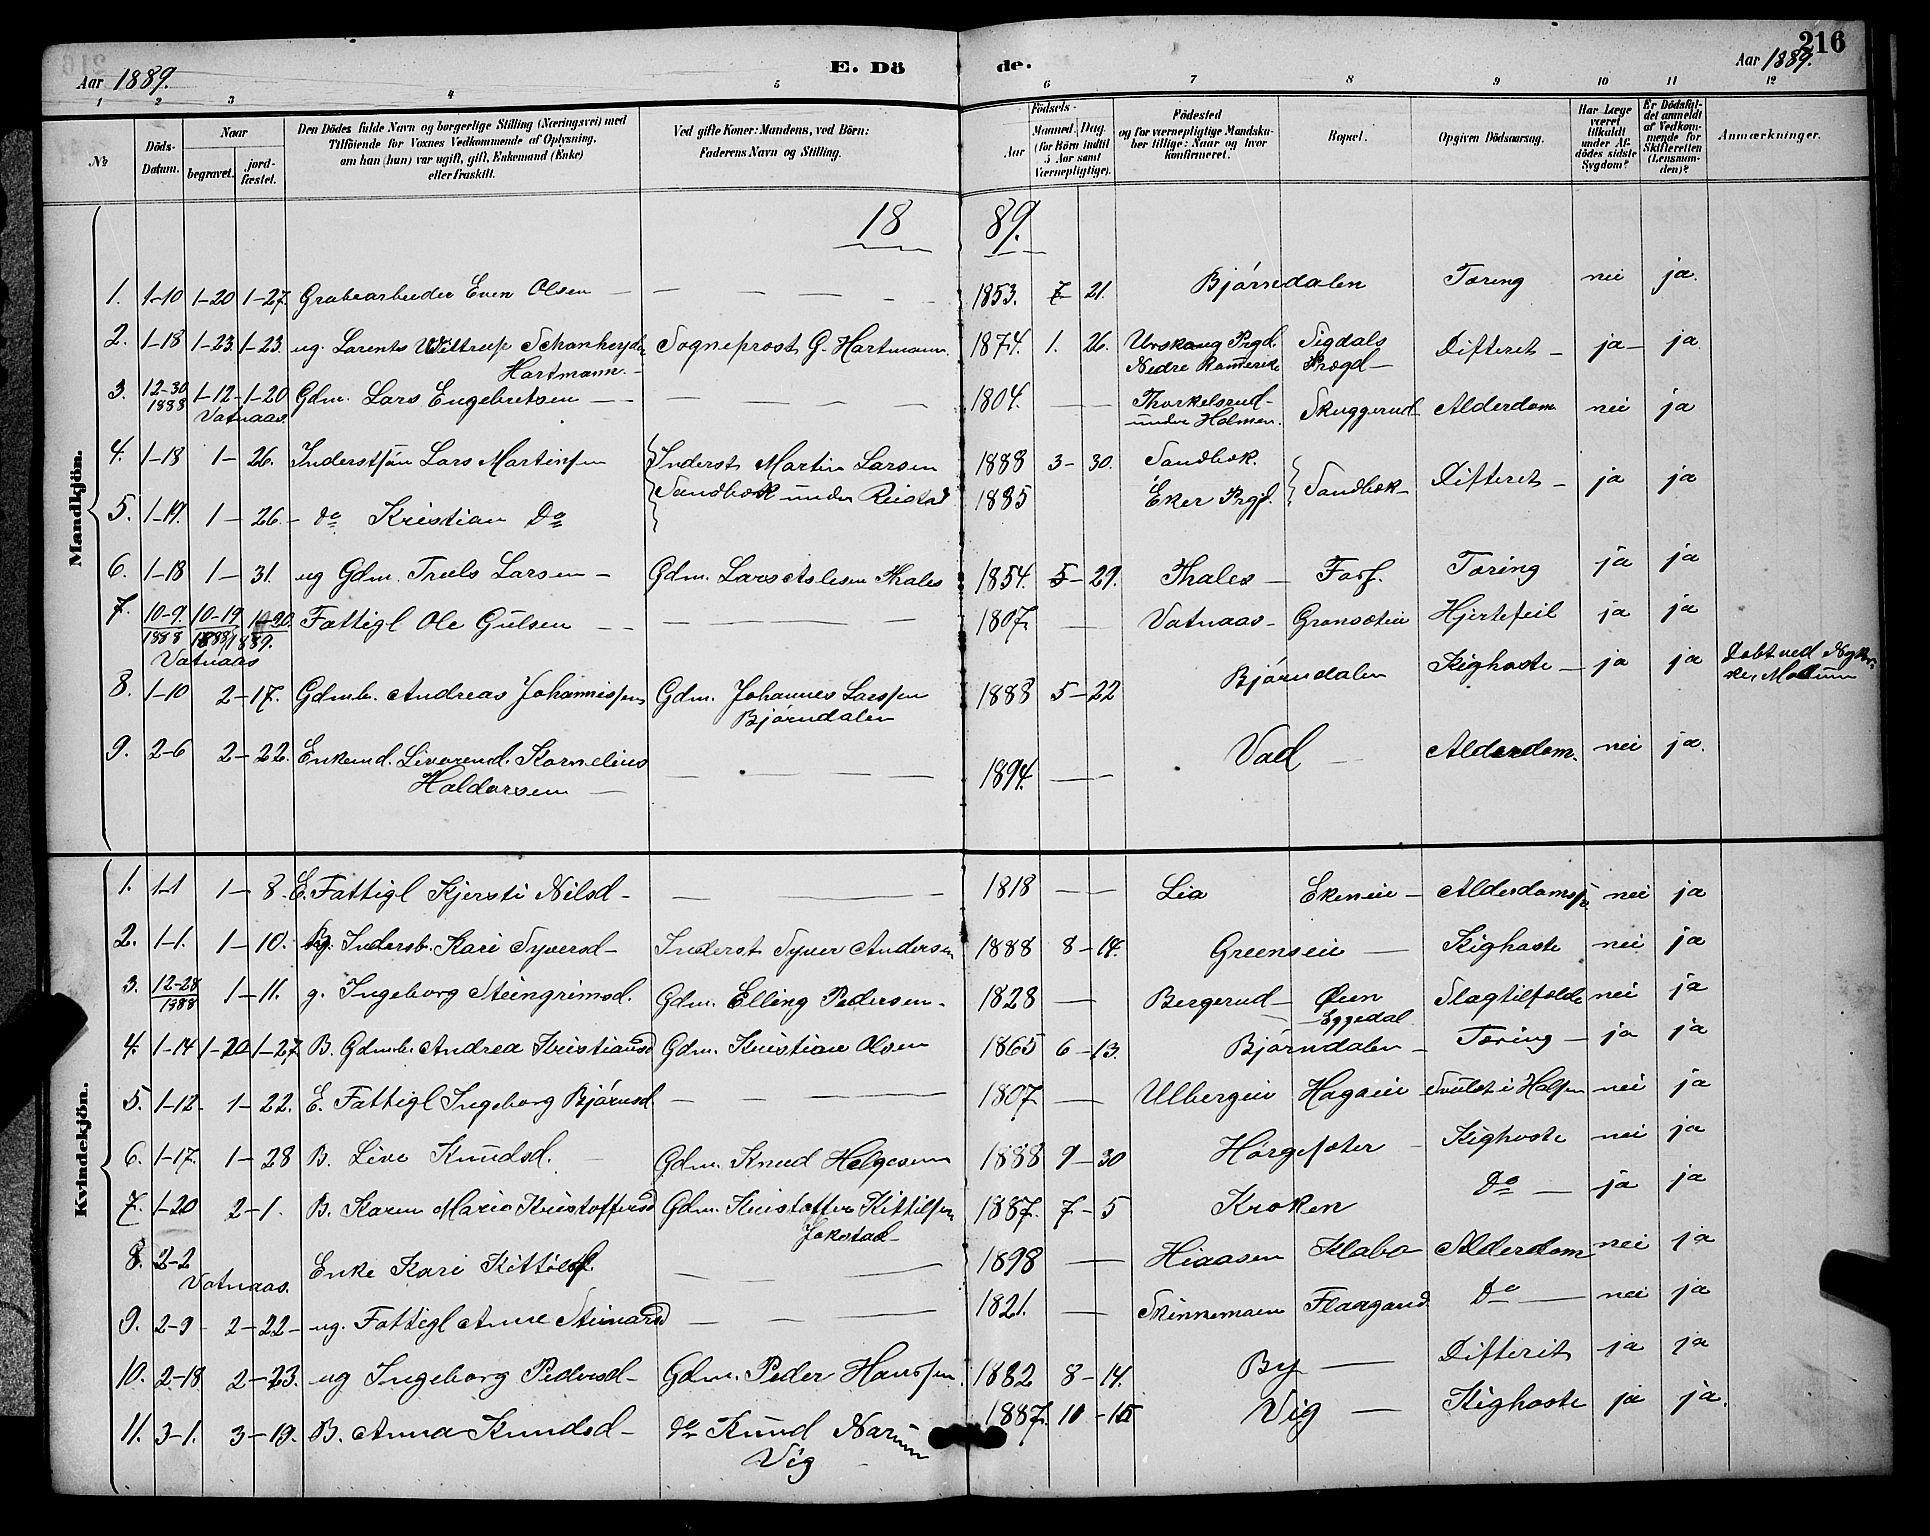 SAKO, Sigdal kirkebøker, G/Ga/L0005: Klokkerbok nr. I 5, 1886-1900, s. 216